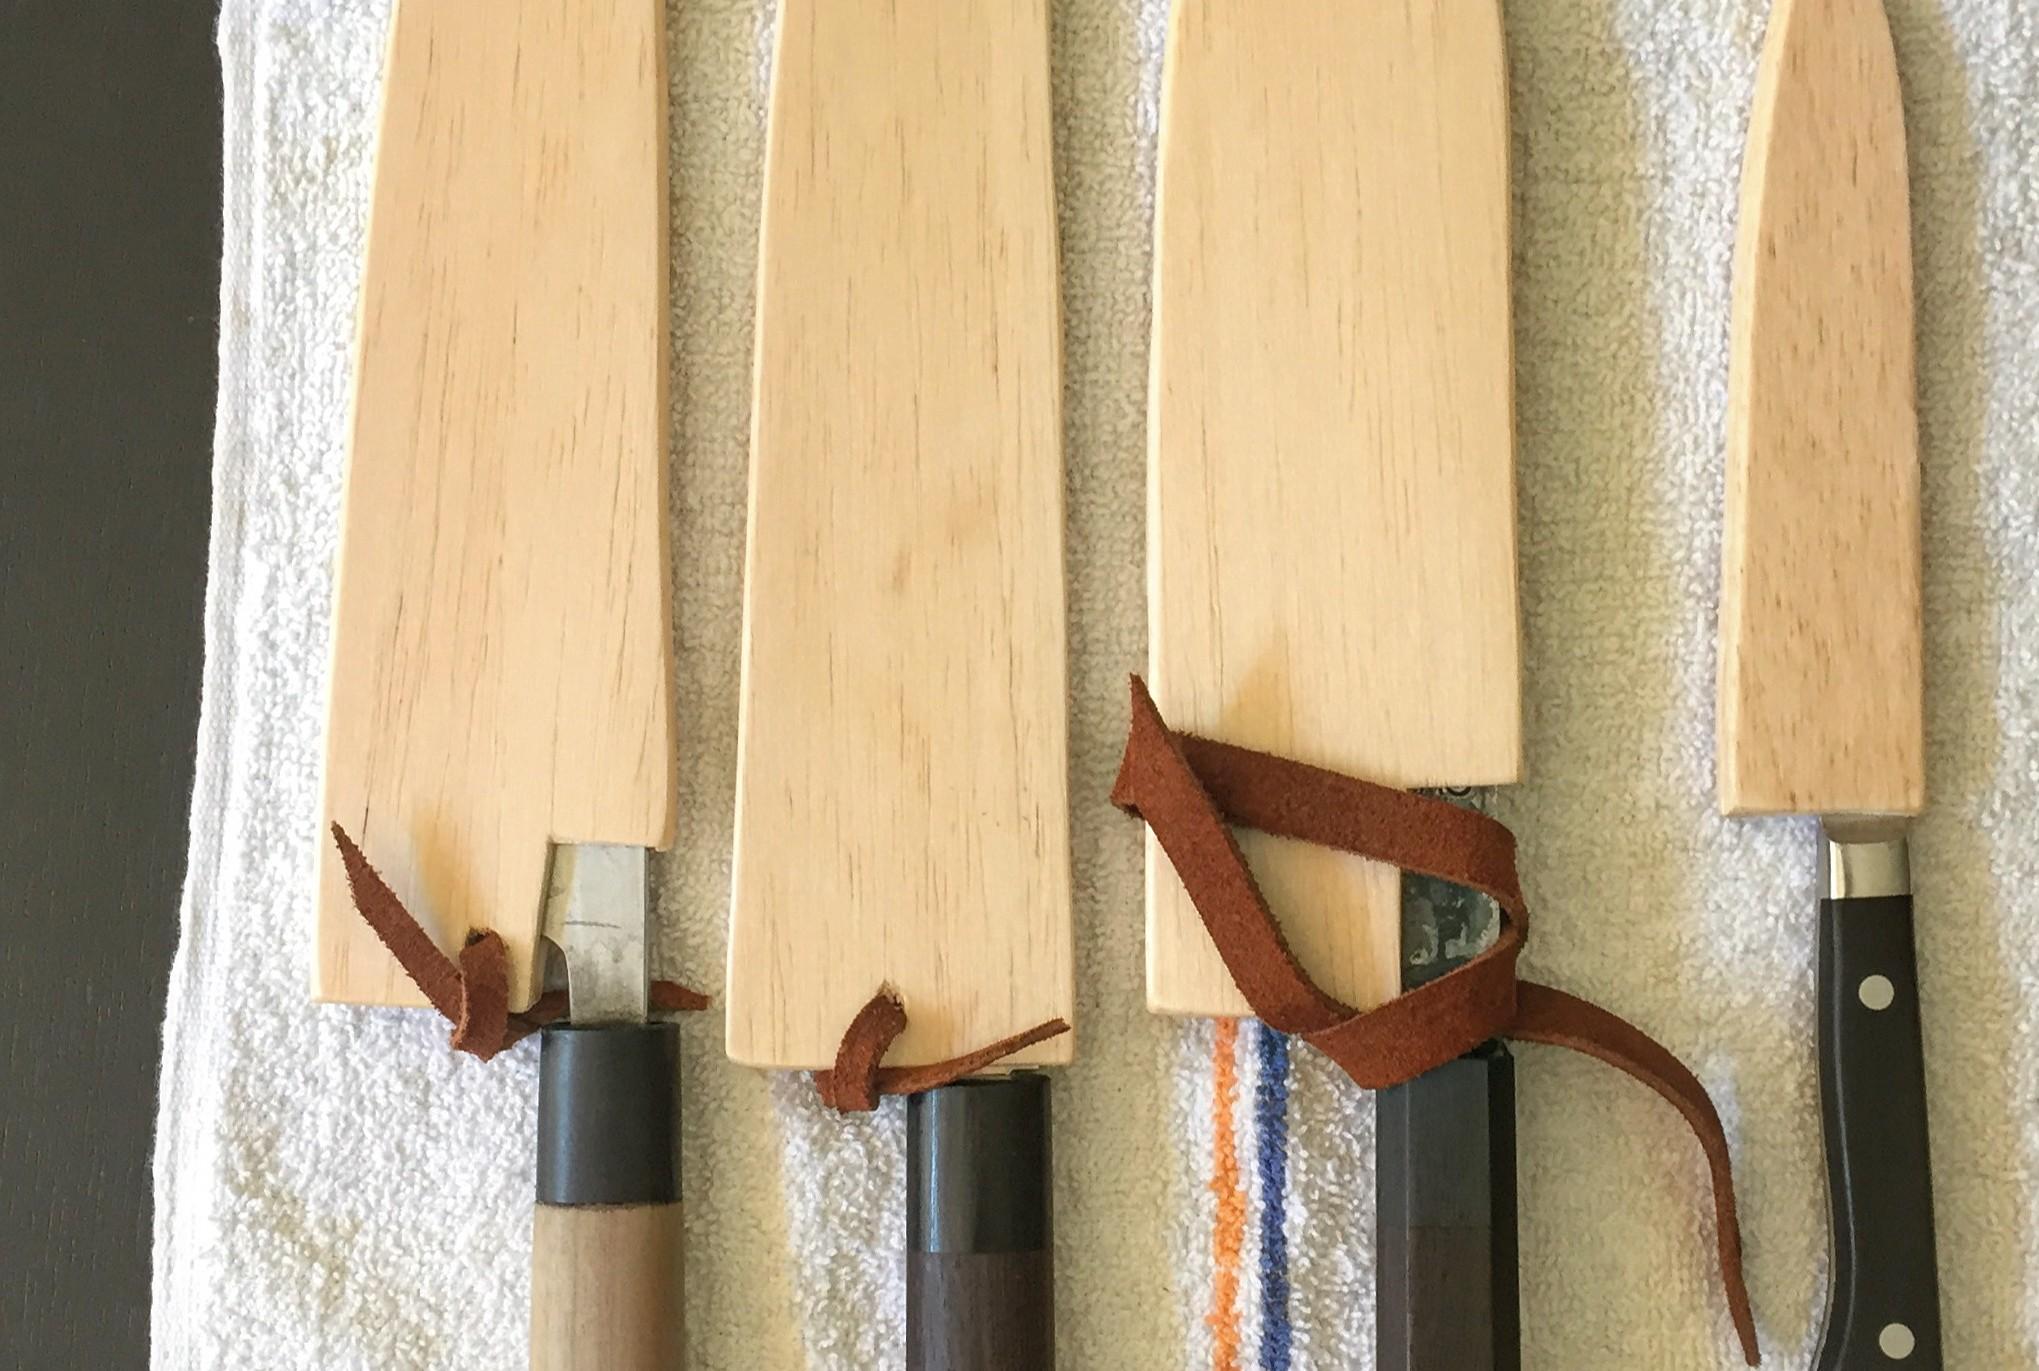 Easy DIY: A Knife Sheath Made from Balsa Wood